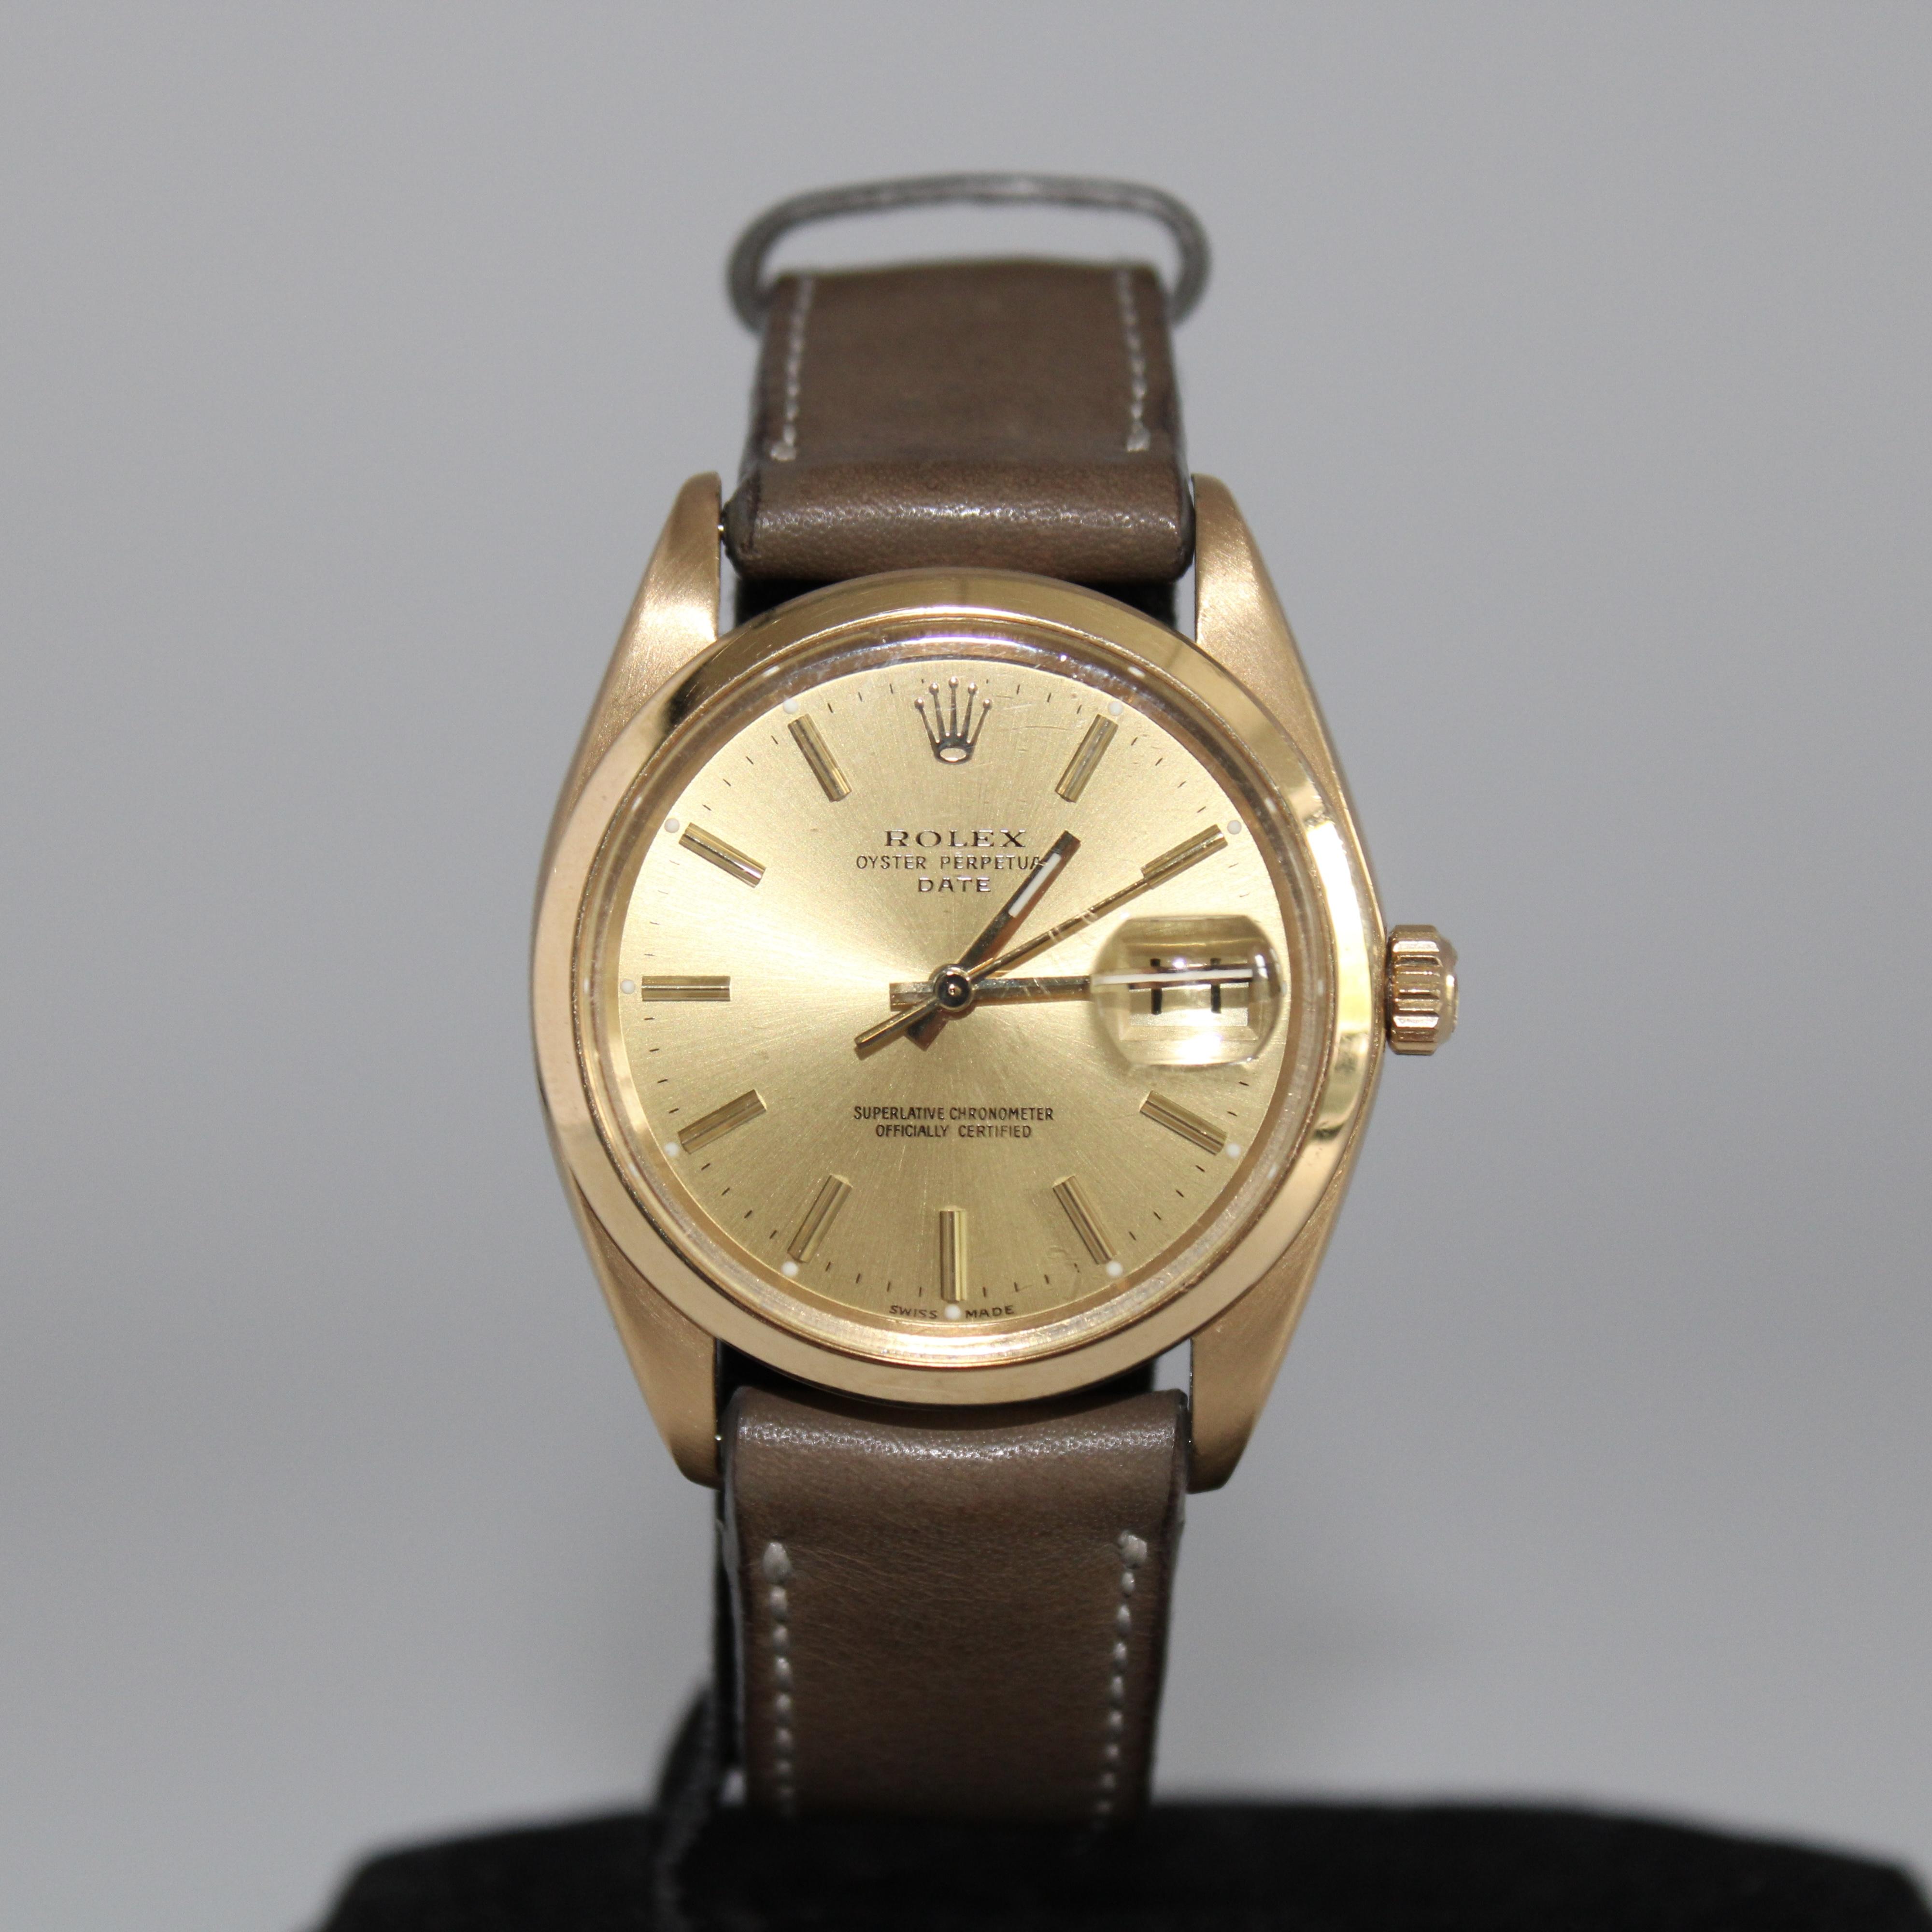 Rolex Oyster Date 18ct Ref 1500